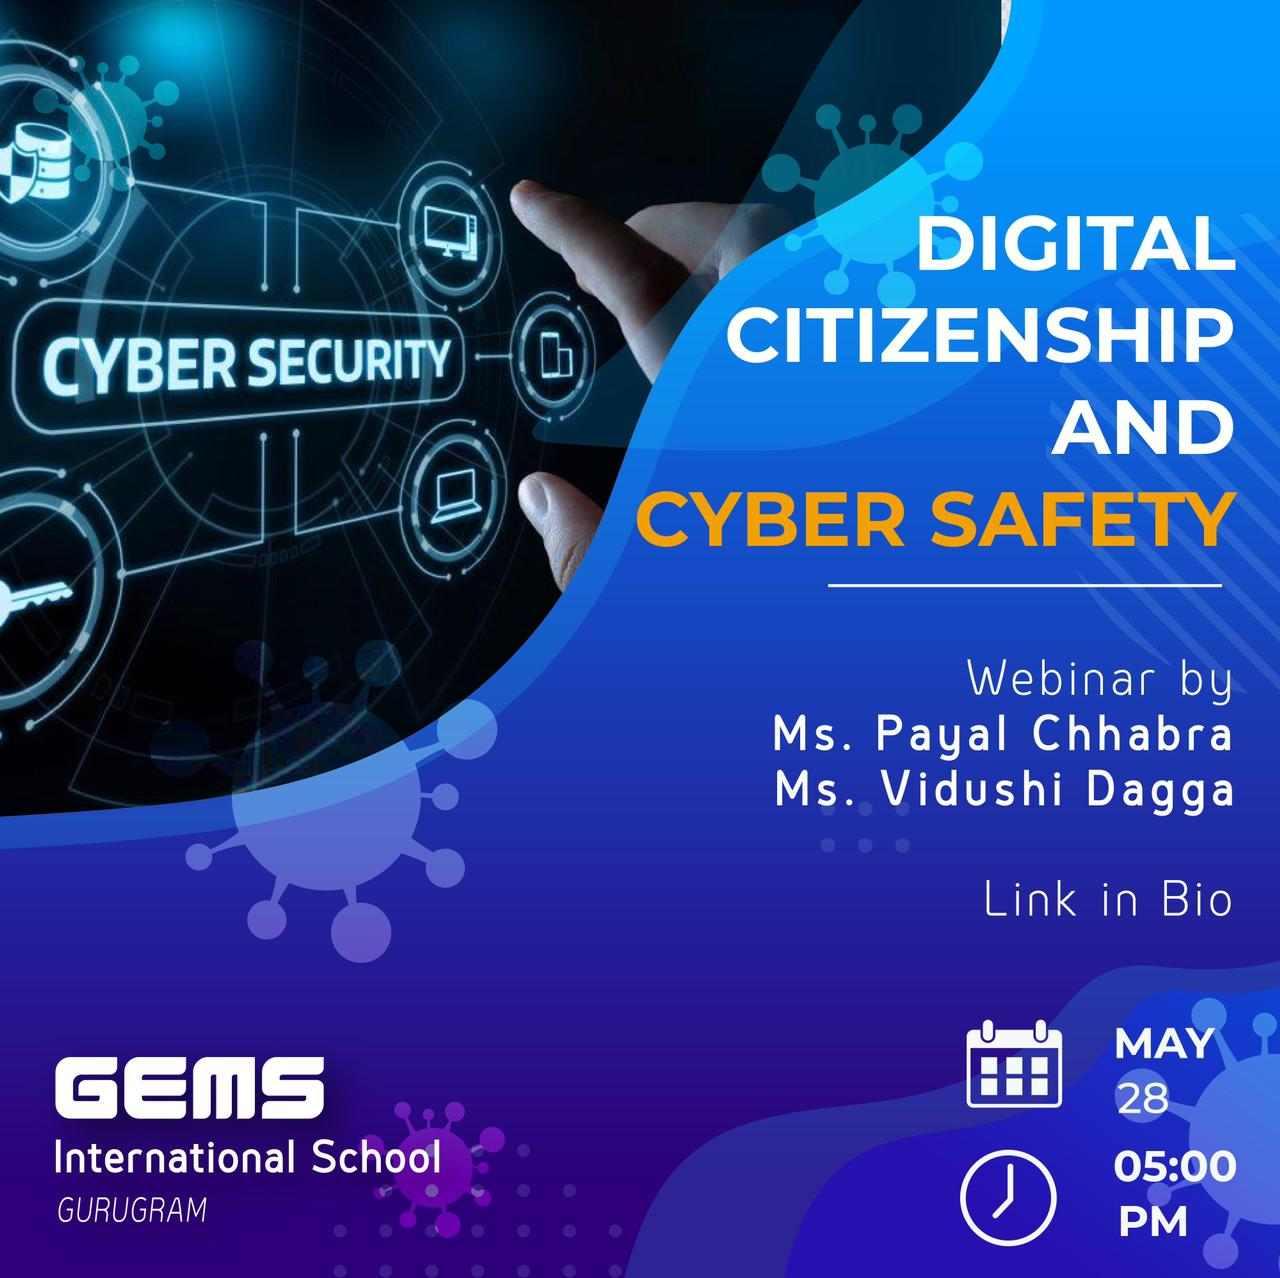 GEMS Cyber security webinar